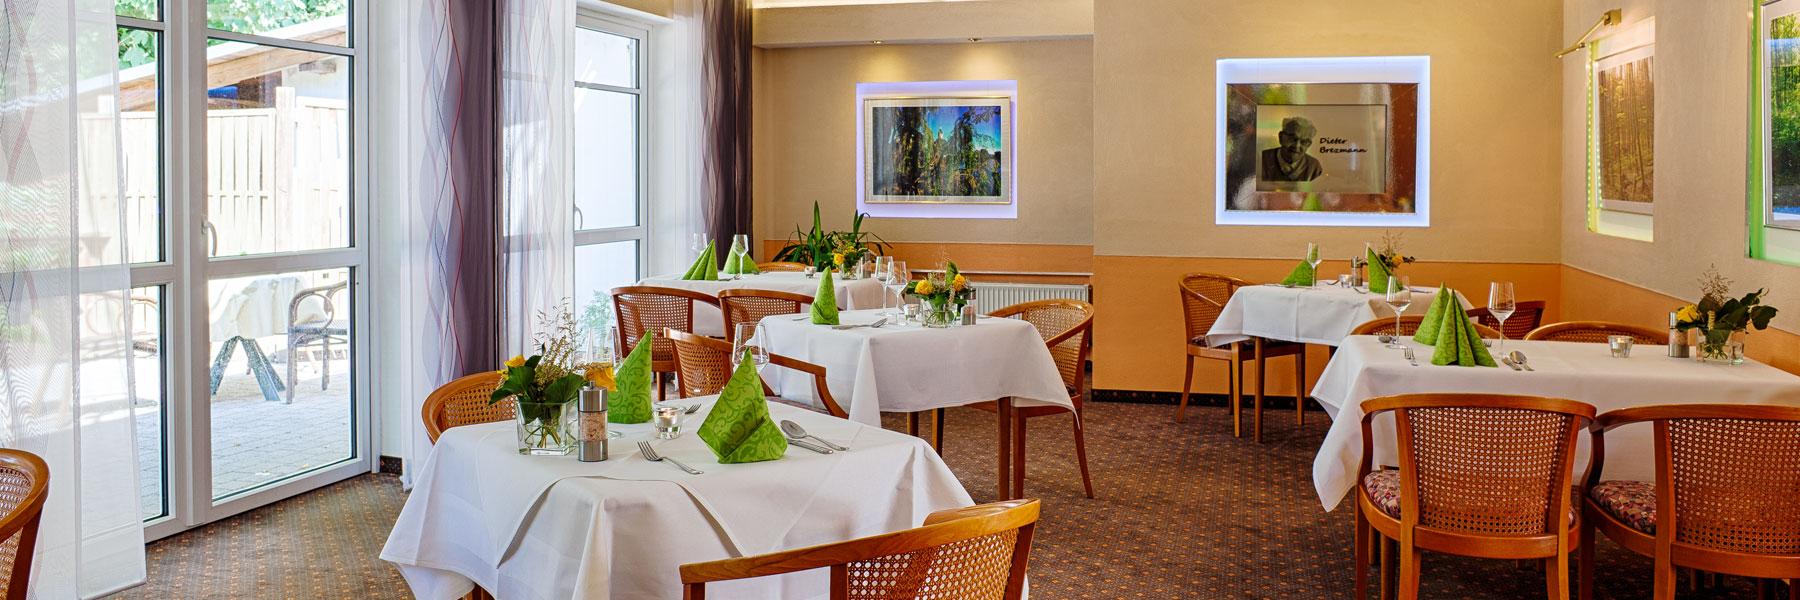 Restaurant - Hotel Carmina am See